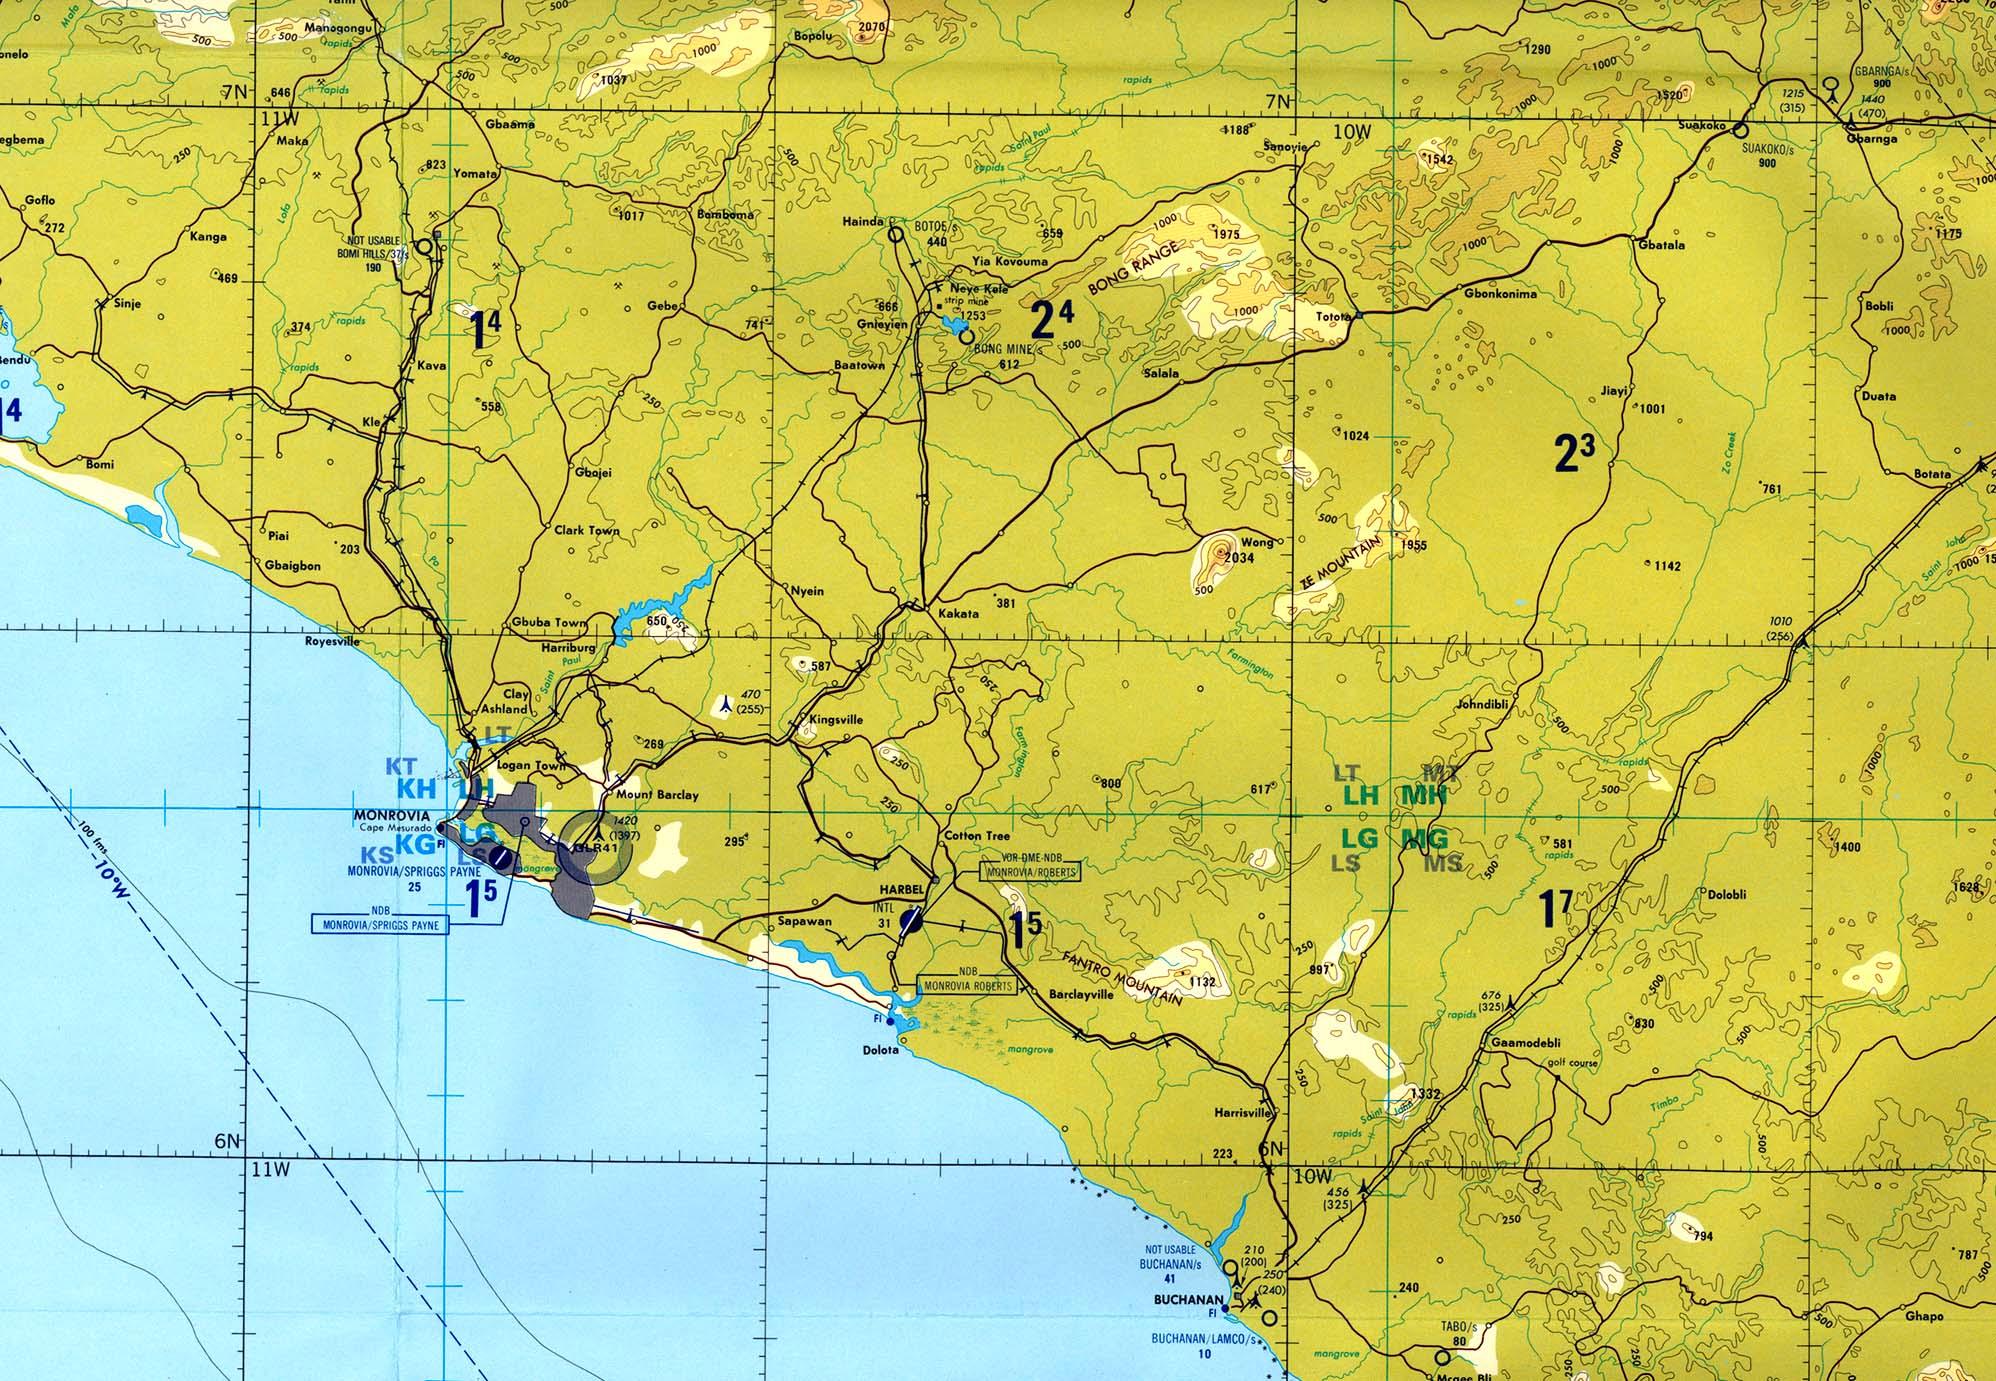 Liberia - Maps - ecoi.net